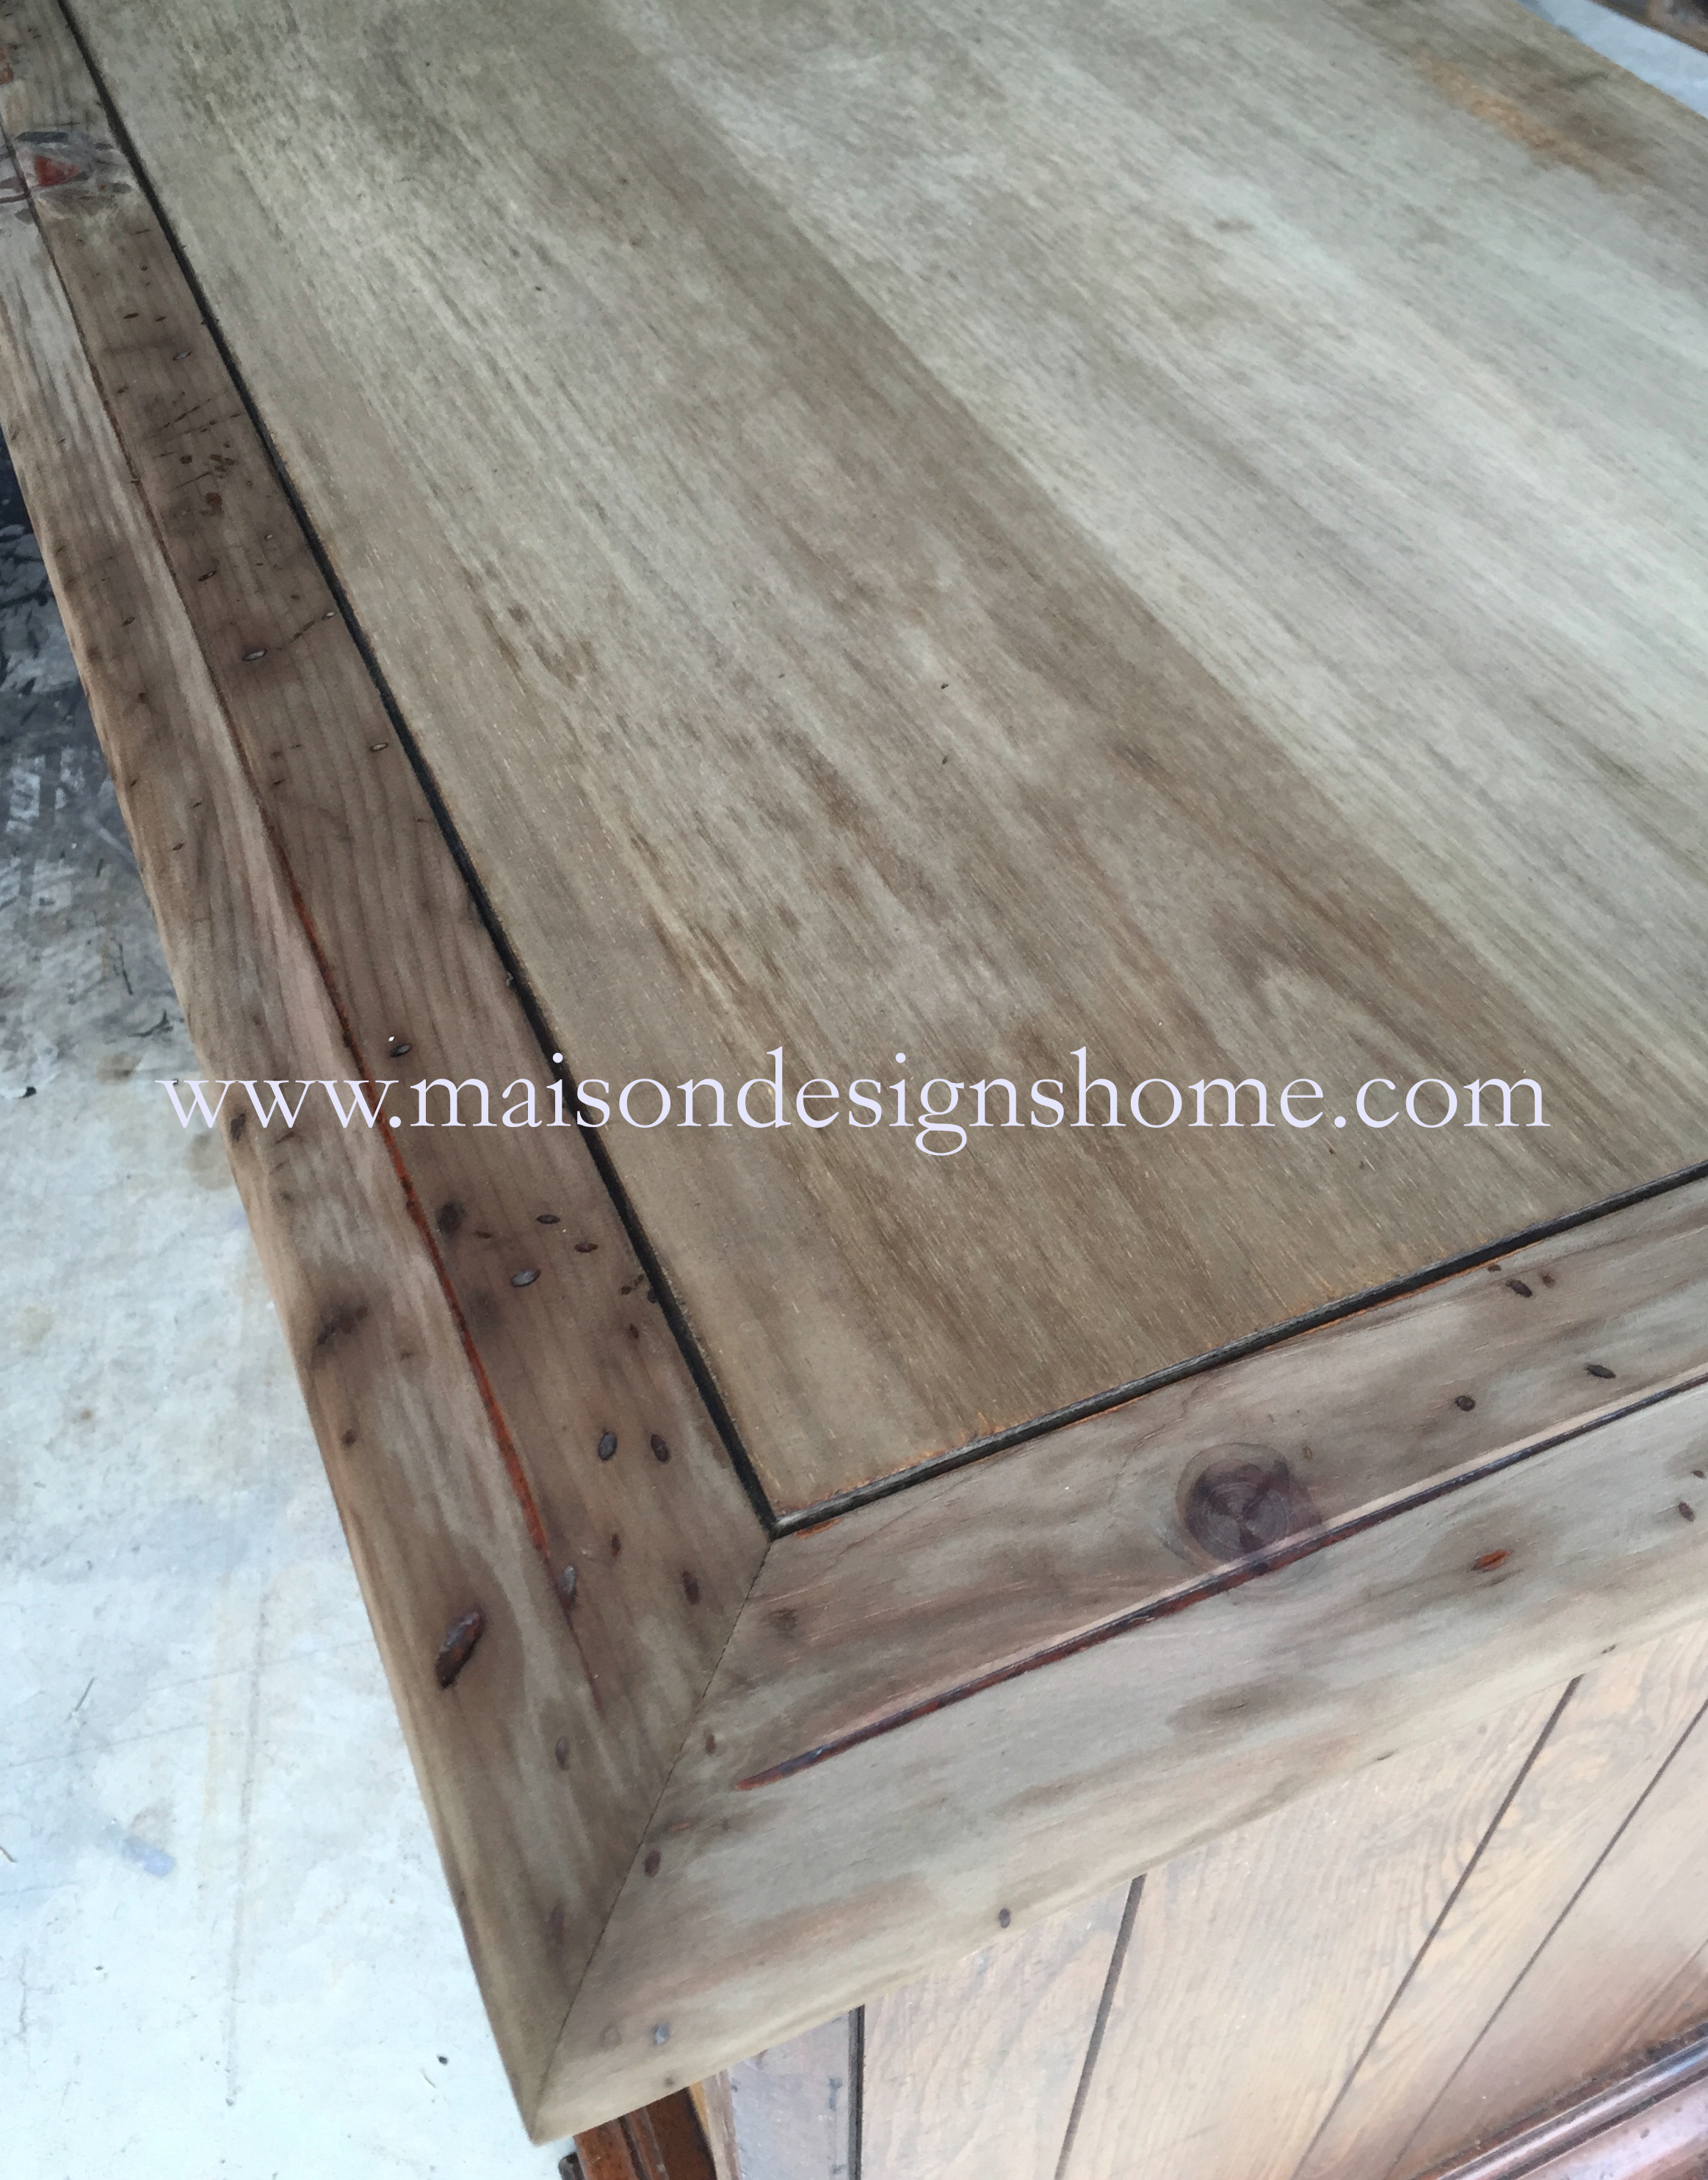 Grey Wash Wood Stain A Restoration Finish Tutorialvinegar Stain Combination Maison